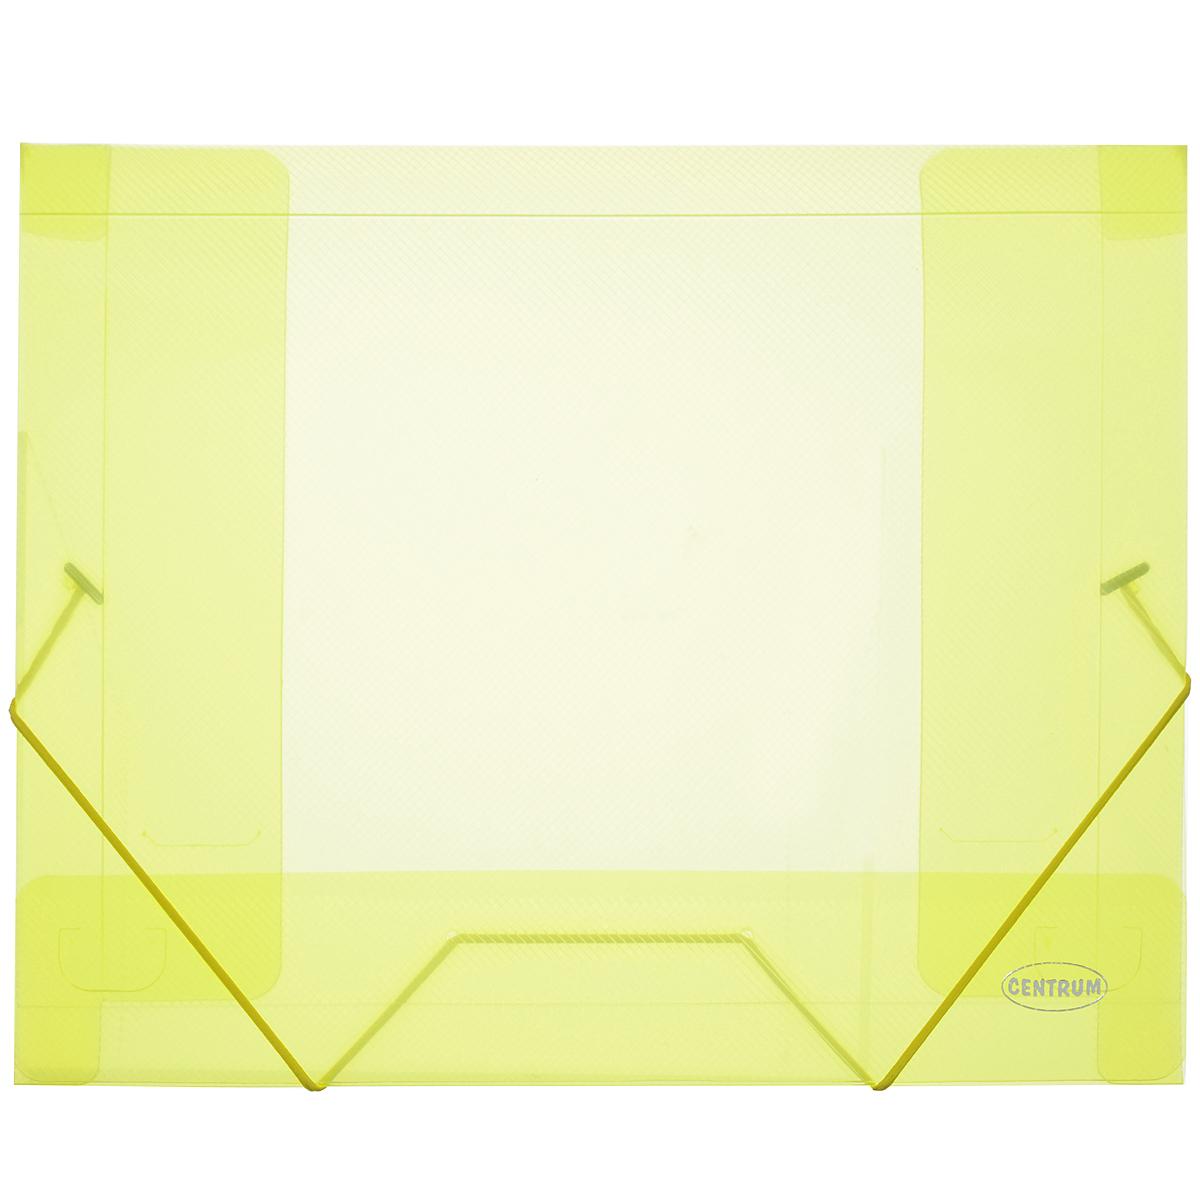 Папка-конверт на резинке Centrum, цвет: желтый. Формат А480019Ж